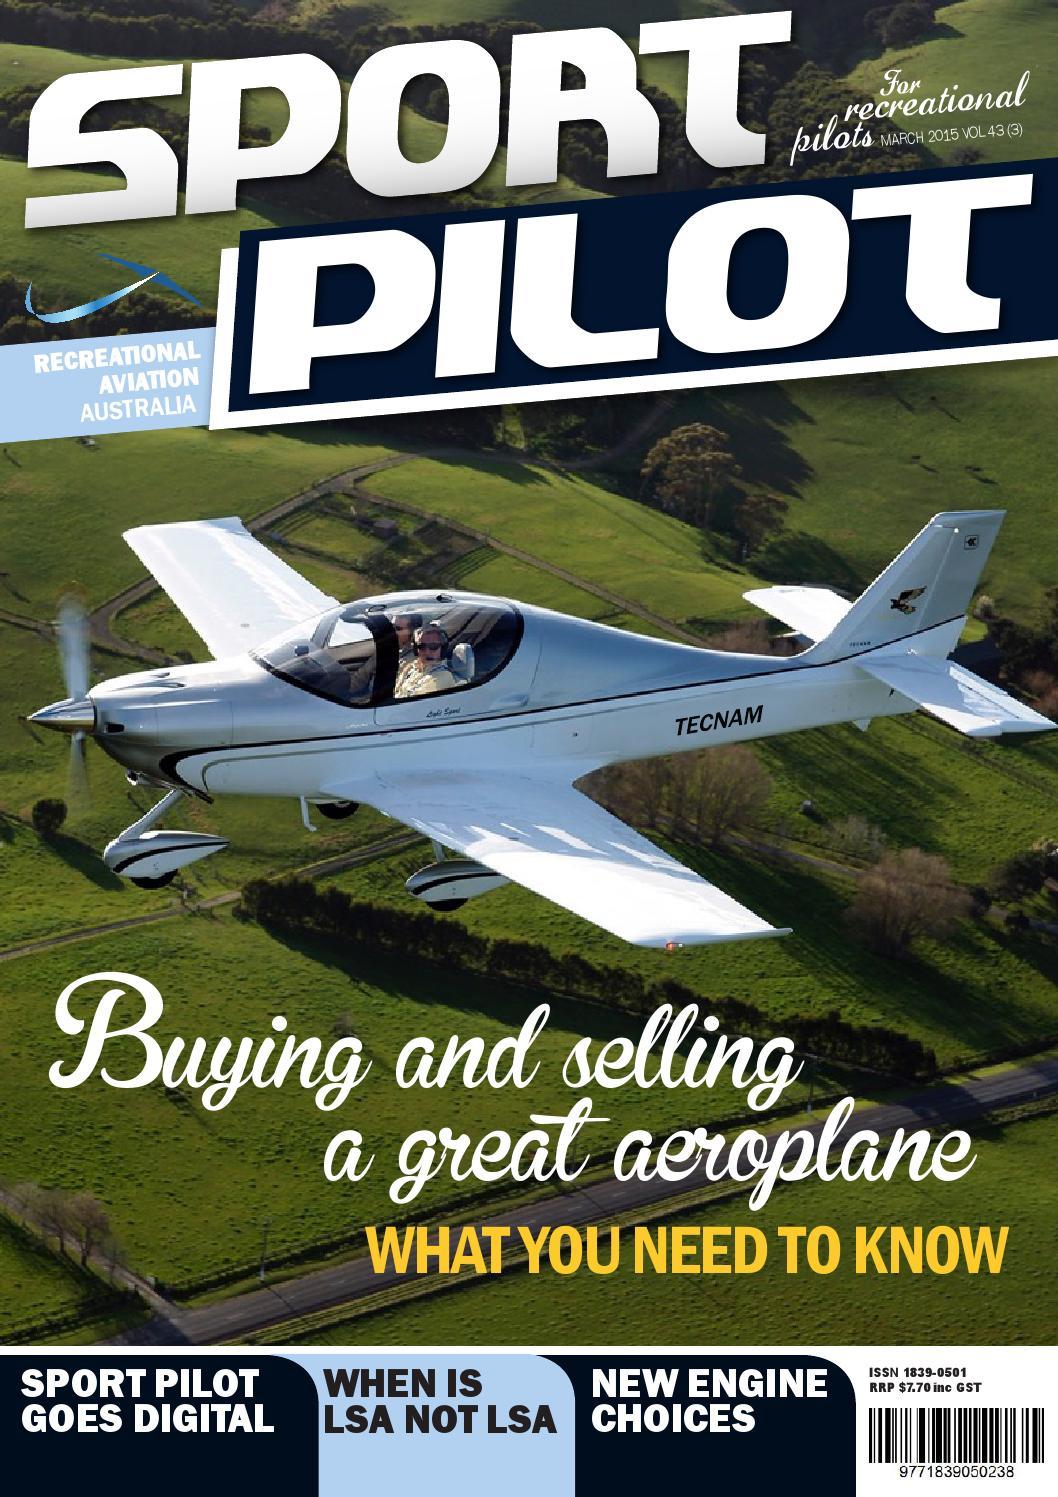 Sport pilot 43 mar 2015 by Recreational Aviation Australia